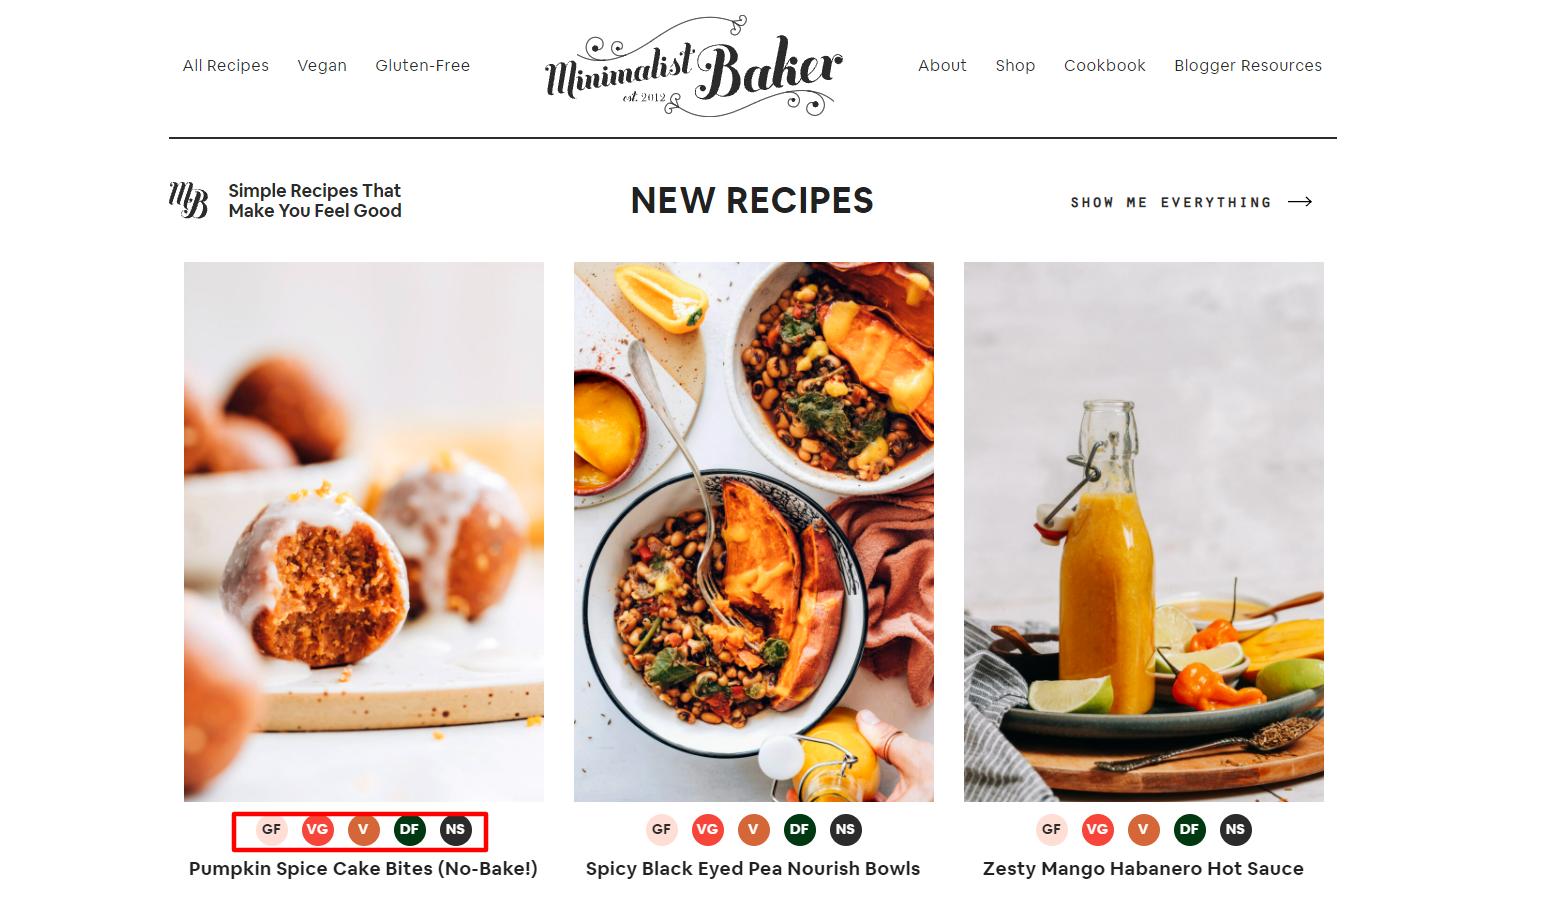 2u 2ieuuezlgCNUTJUw aSLgAa0ryKJ4oE8UcqOMh dck6x9AXwDCIKo1GJltl Ultimate Guide To Being A Food Blogger